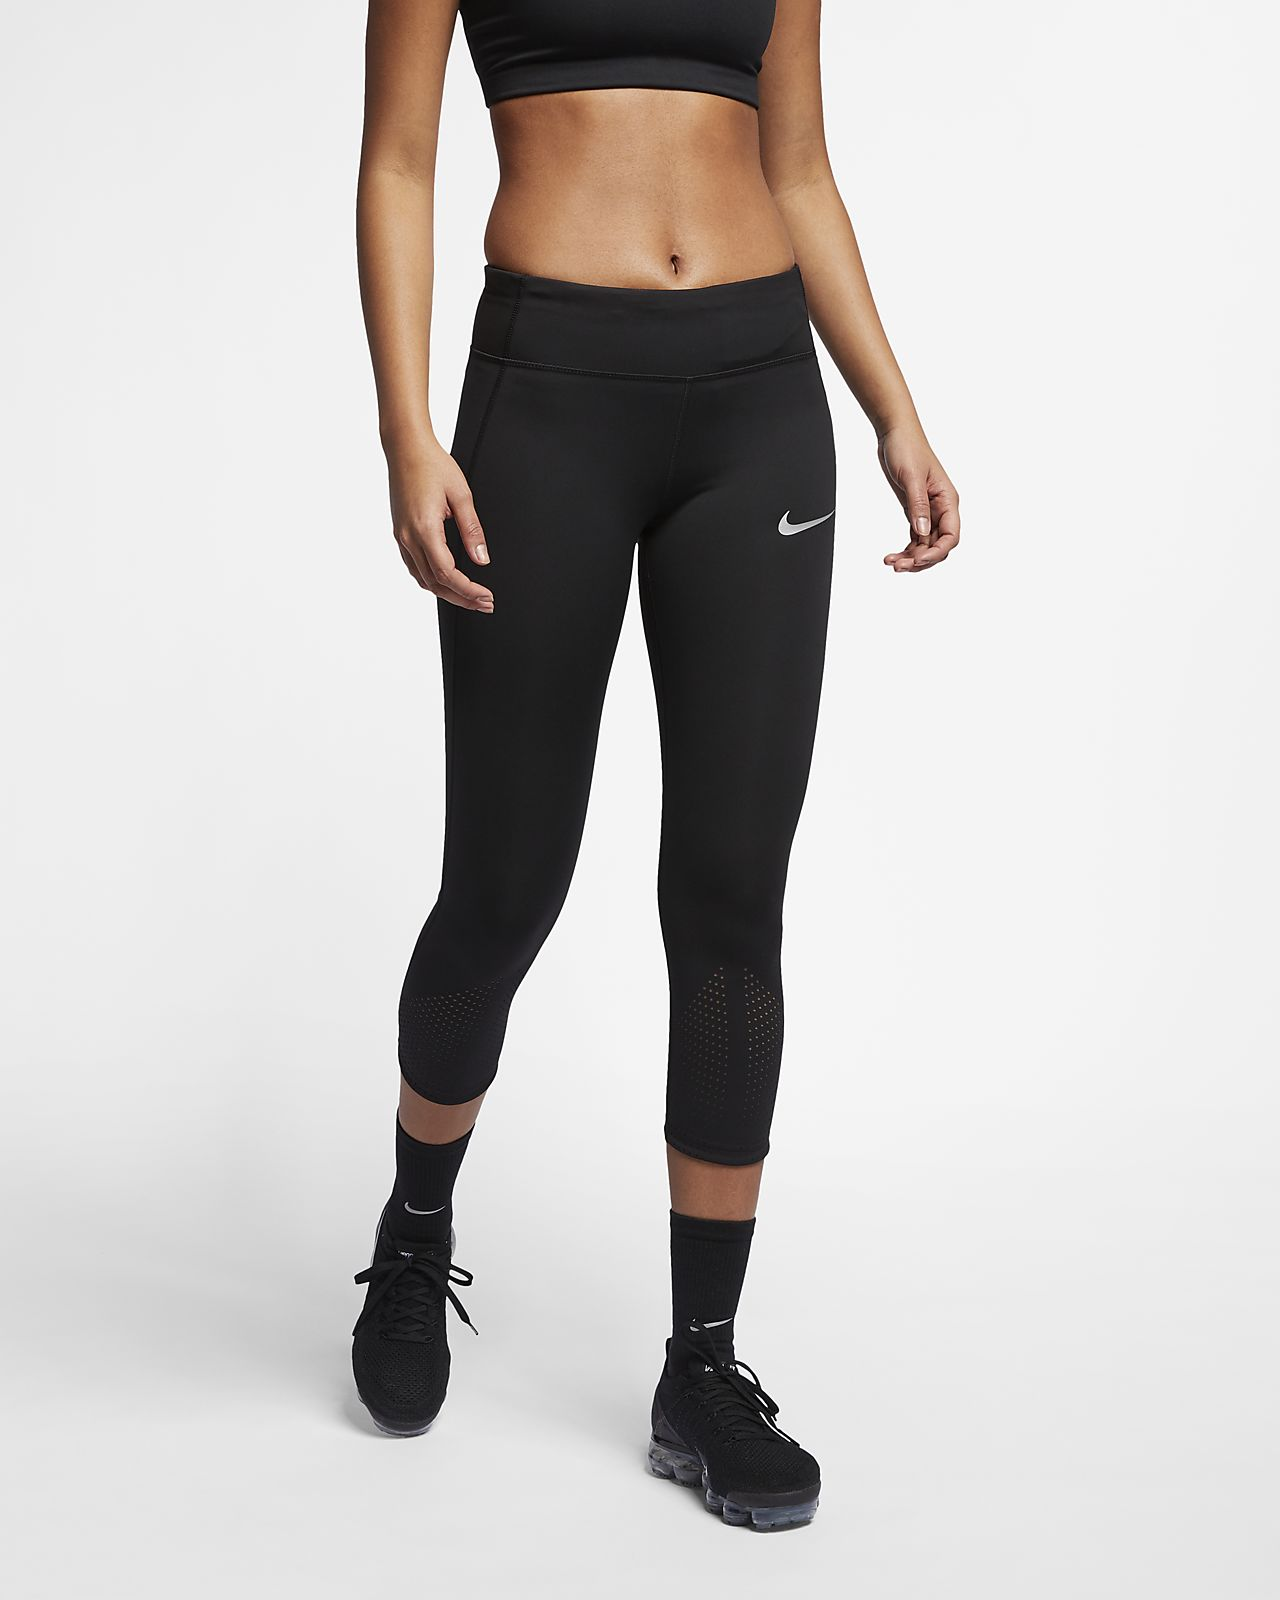 Nike Epic Lux Damen-Laufcaprihose